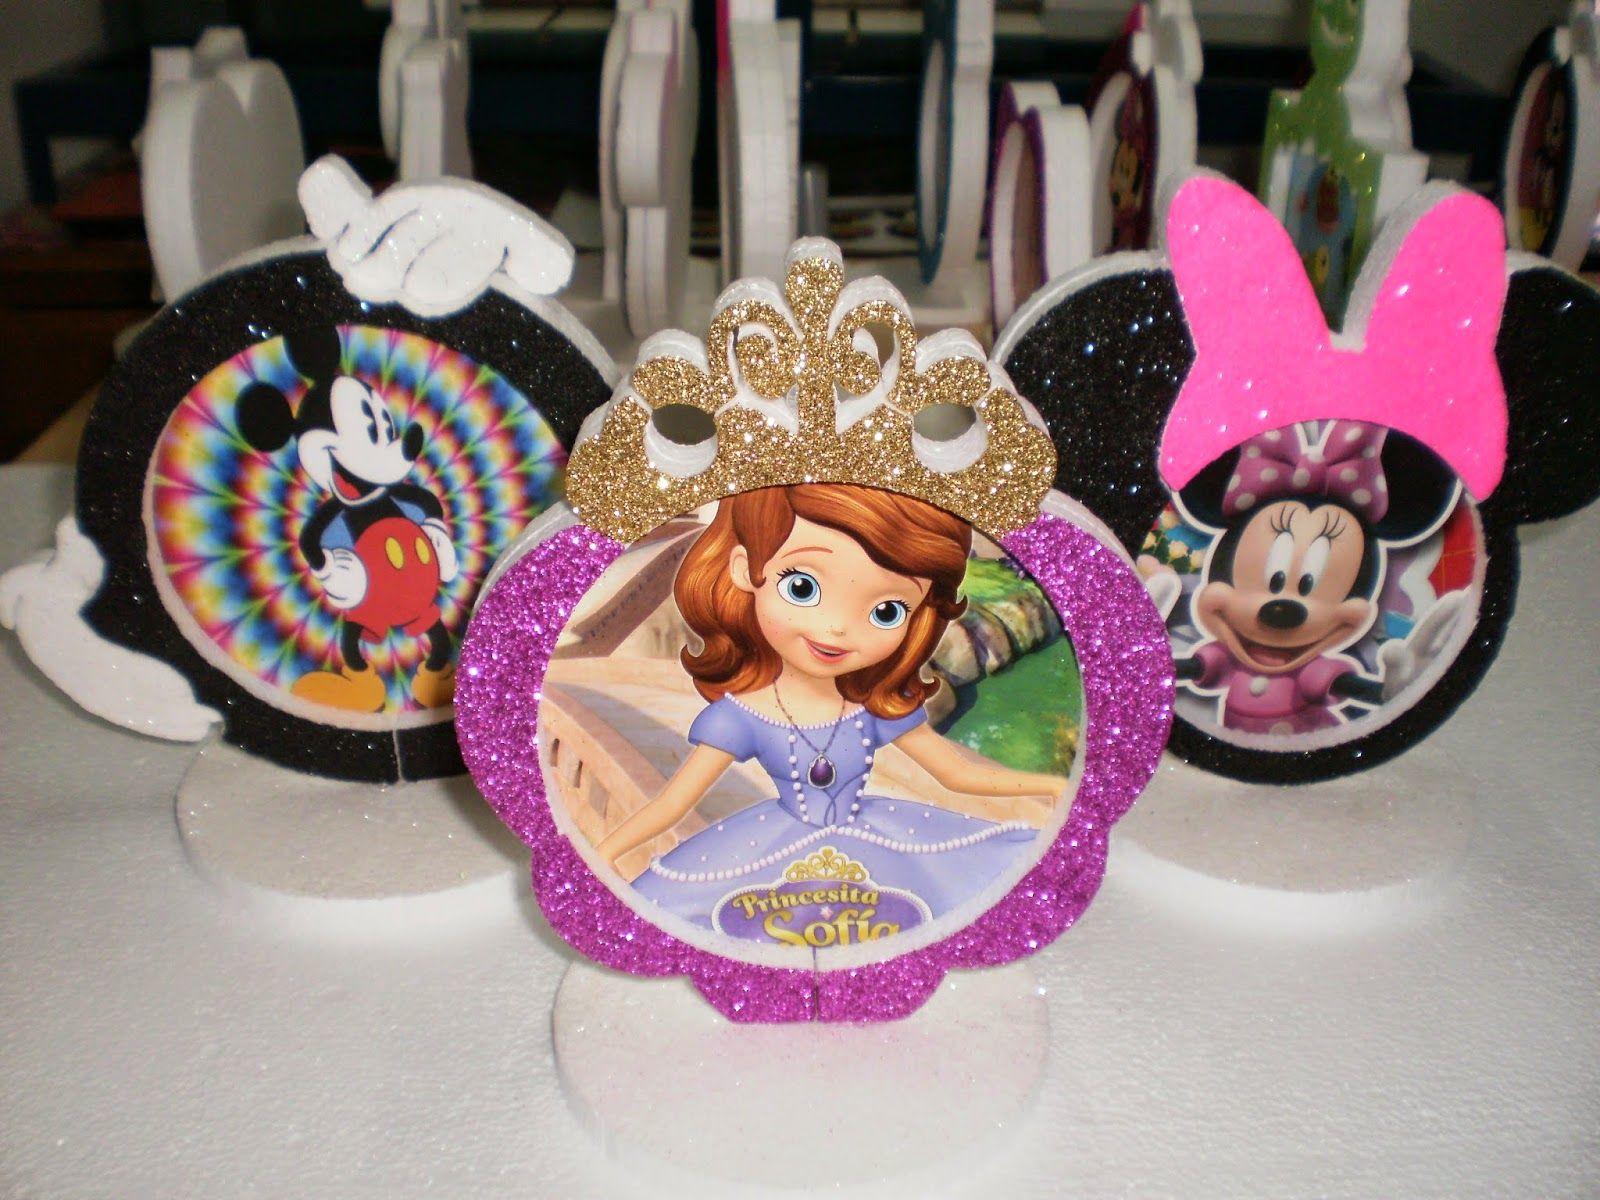 2eec79734 adorno para torta - Buscar con Google | letras | Character, Disney ...